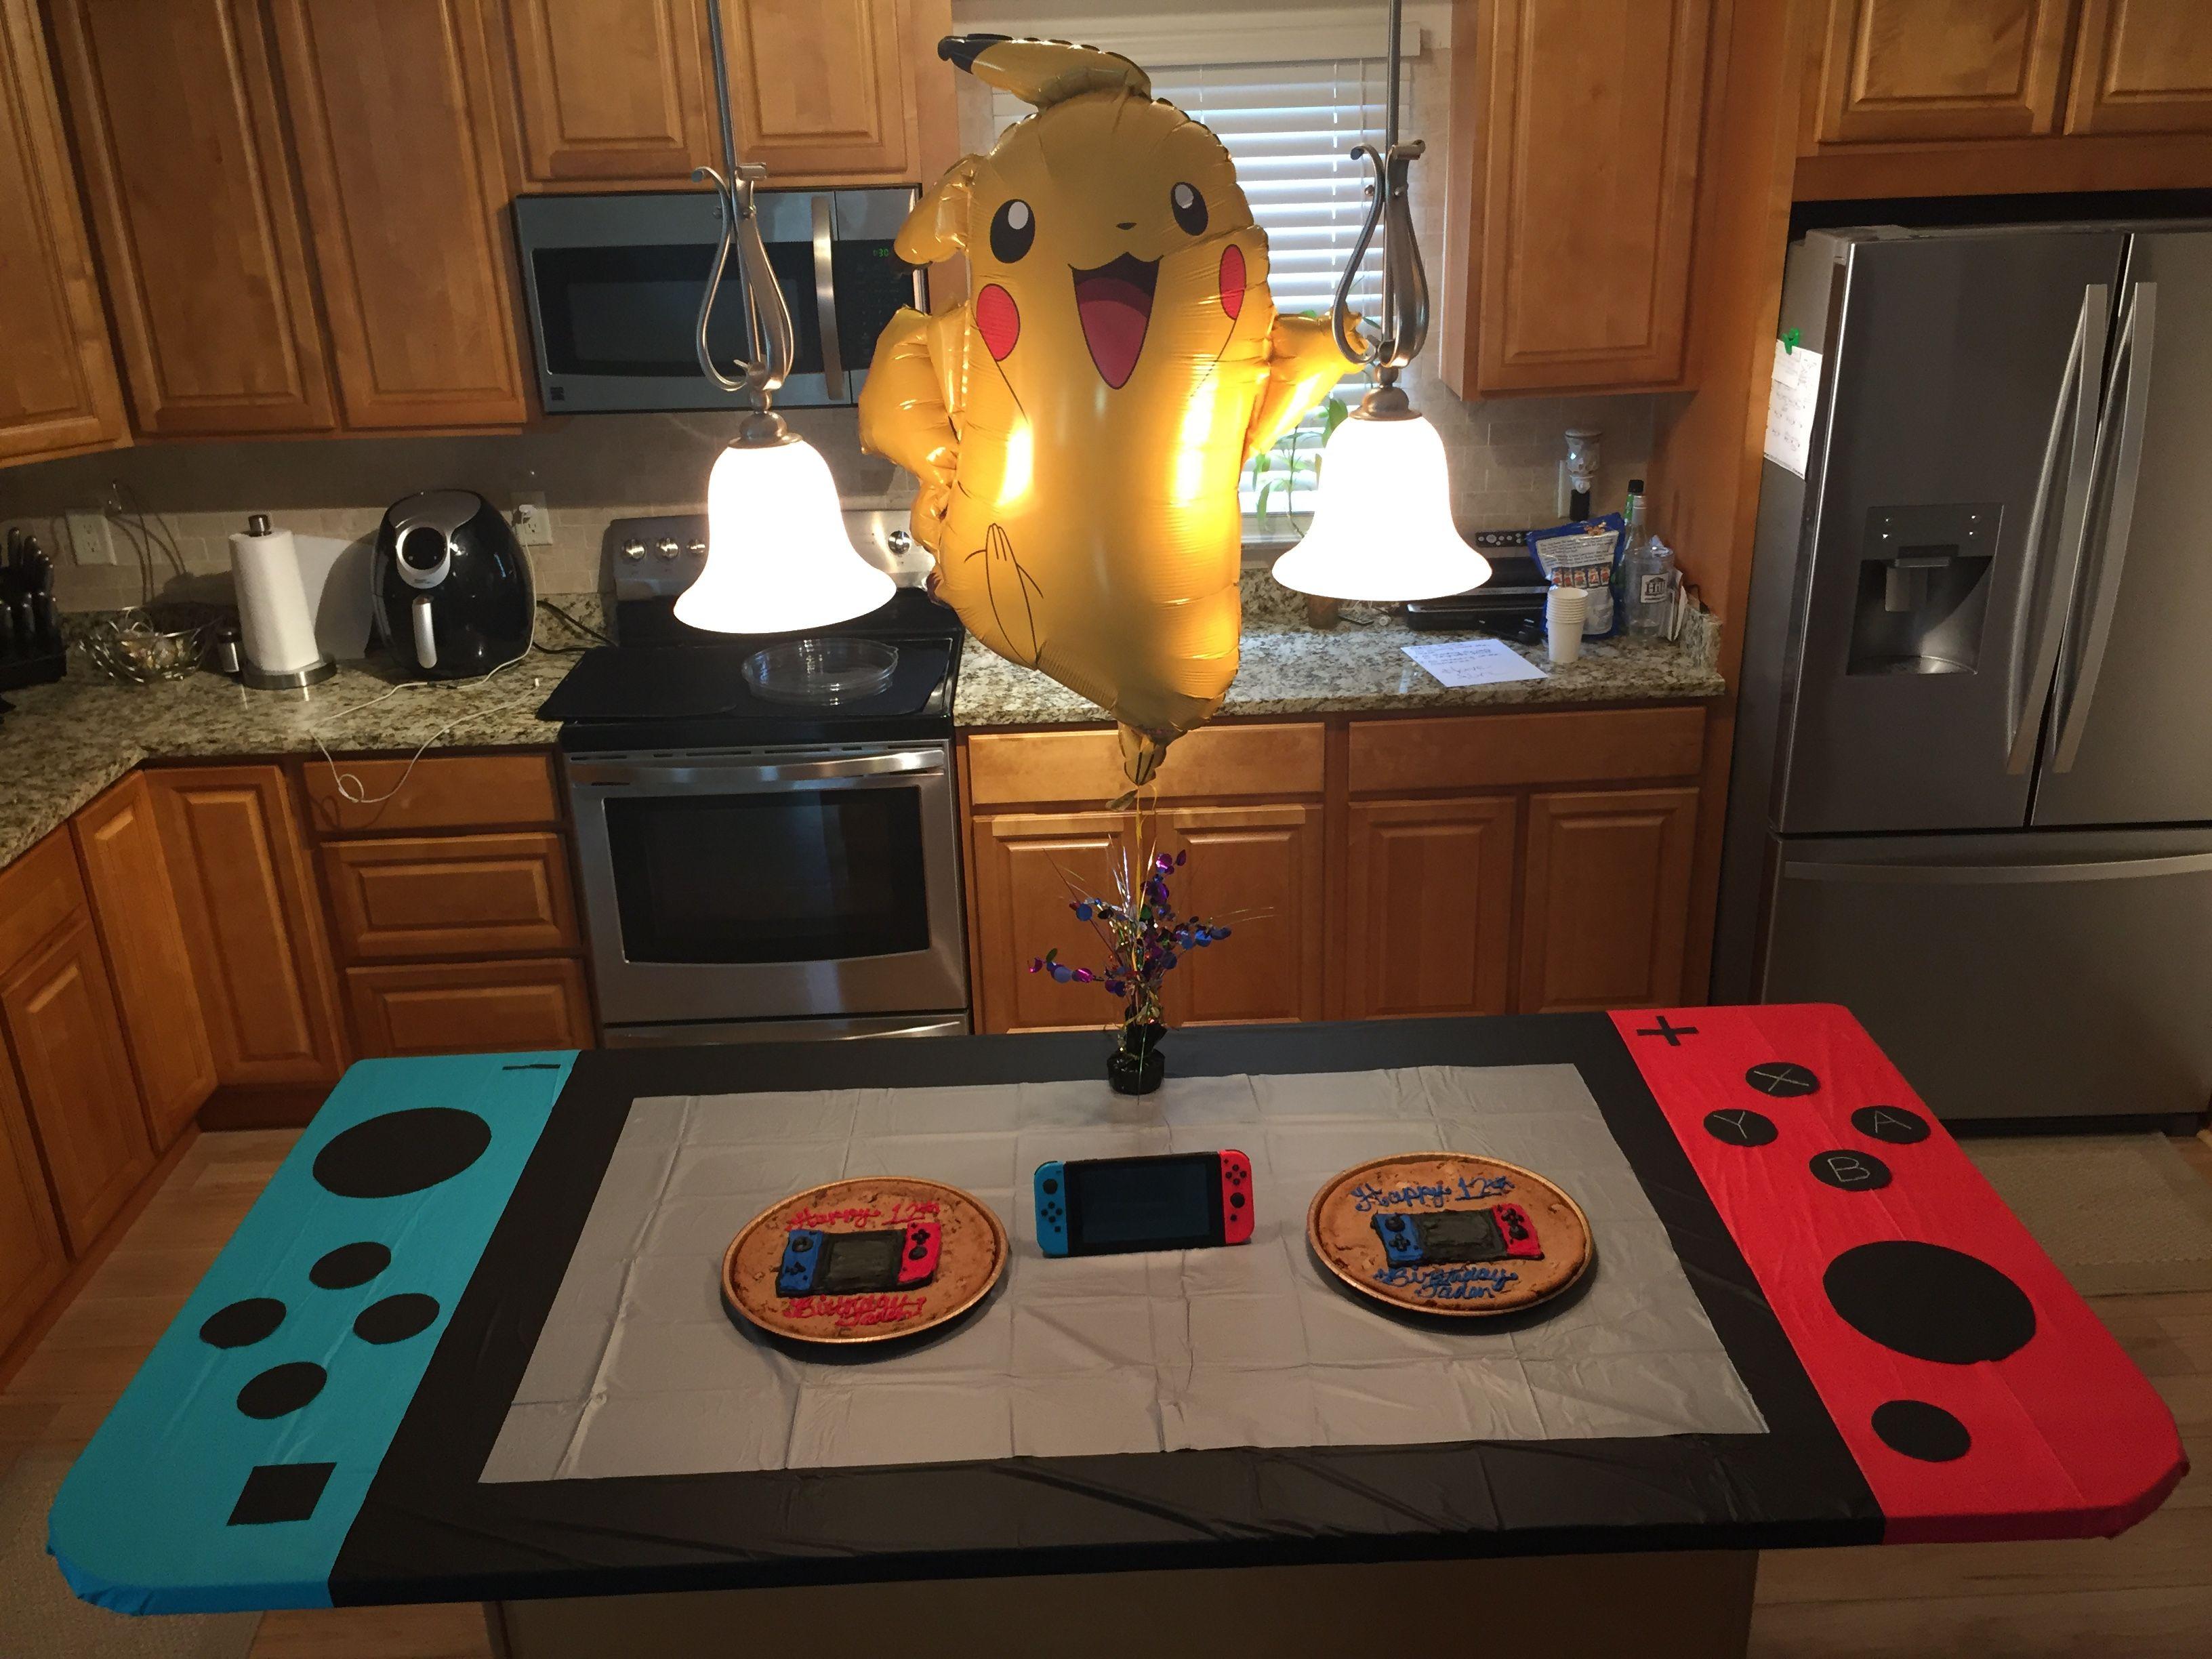 Nintendo switch party table I made. Nintendo birthday